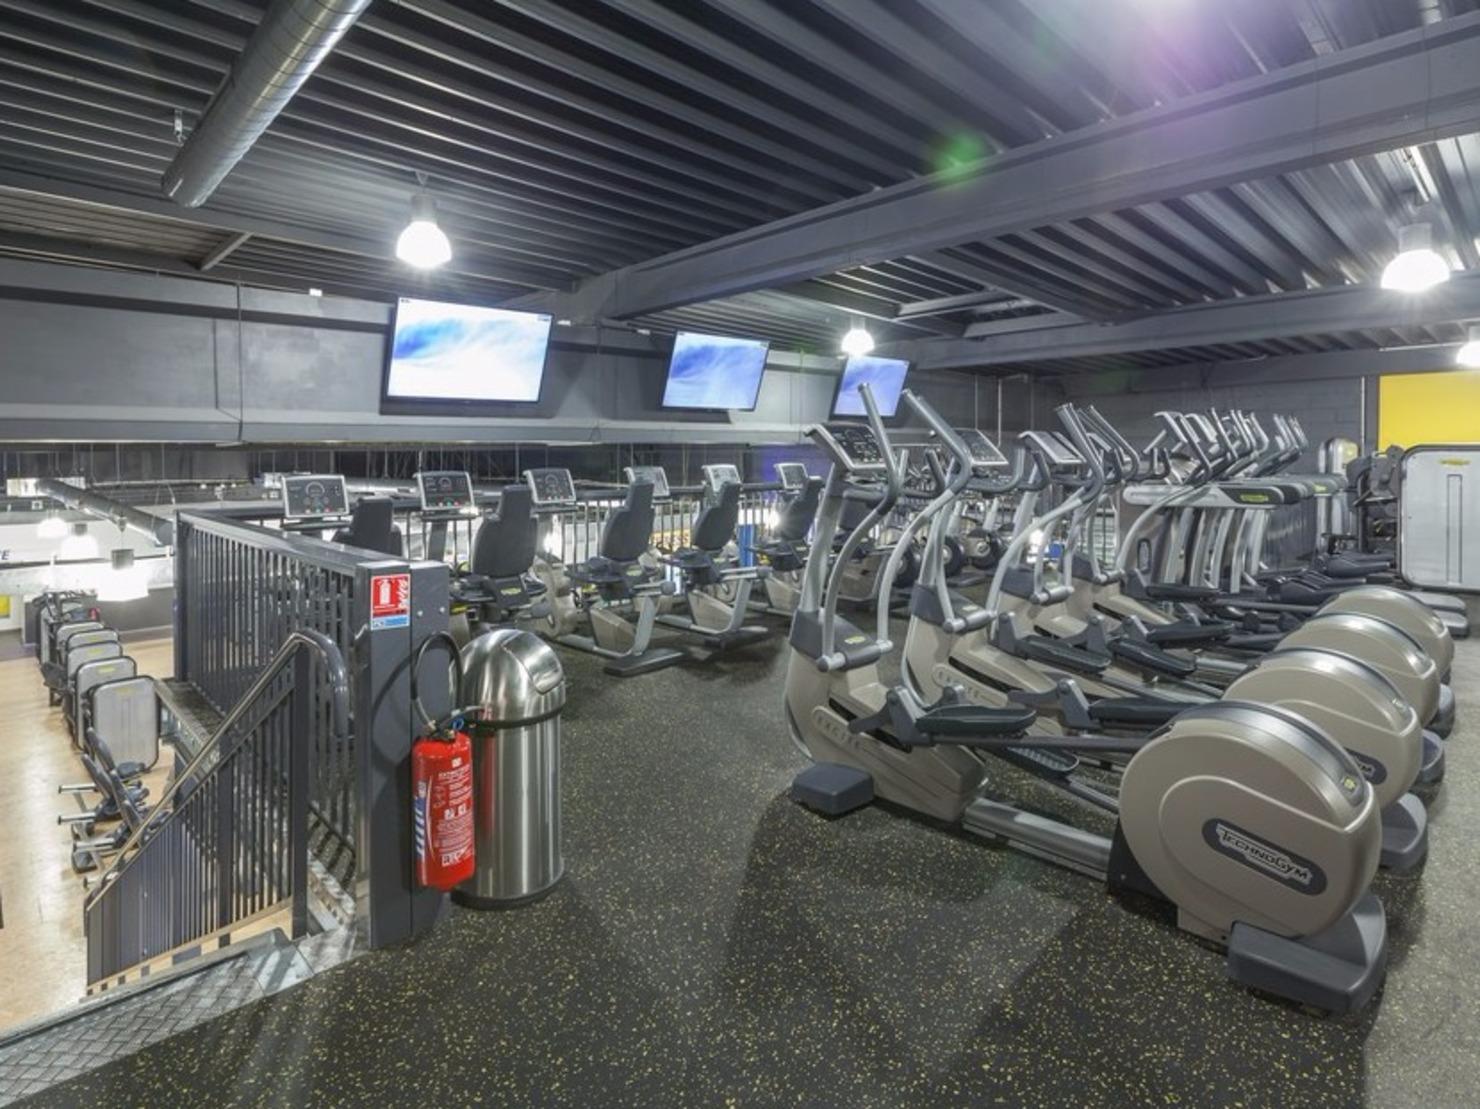 fitness park bobigny tarifs avis horaires essai gratuit. Black Bedroom Furniture Sets. Home Design Ideas